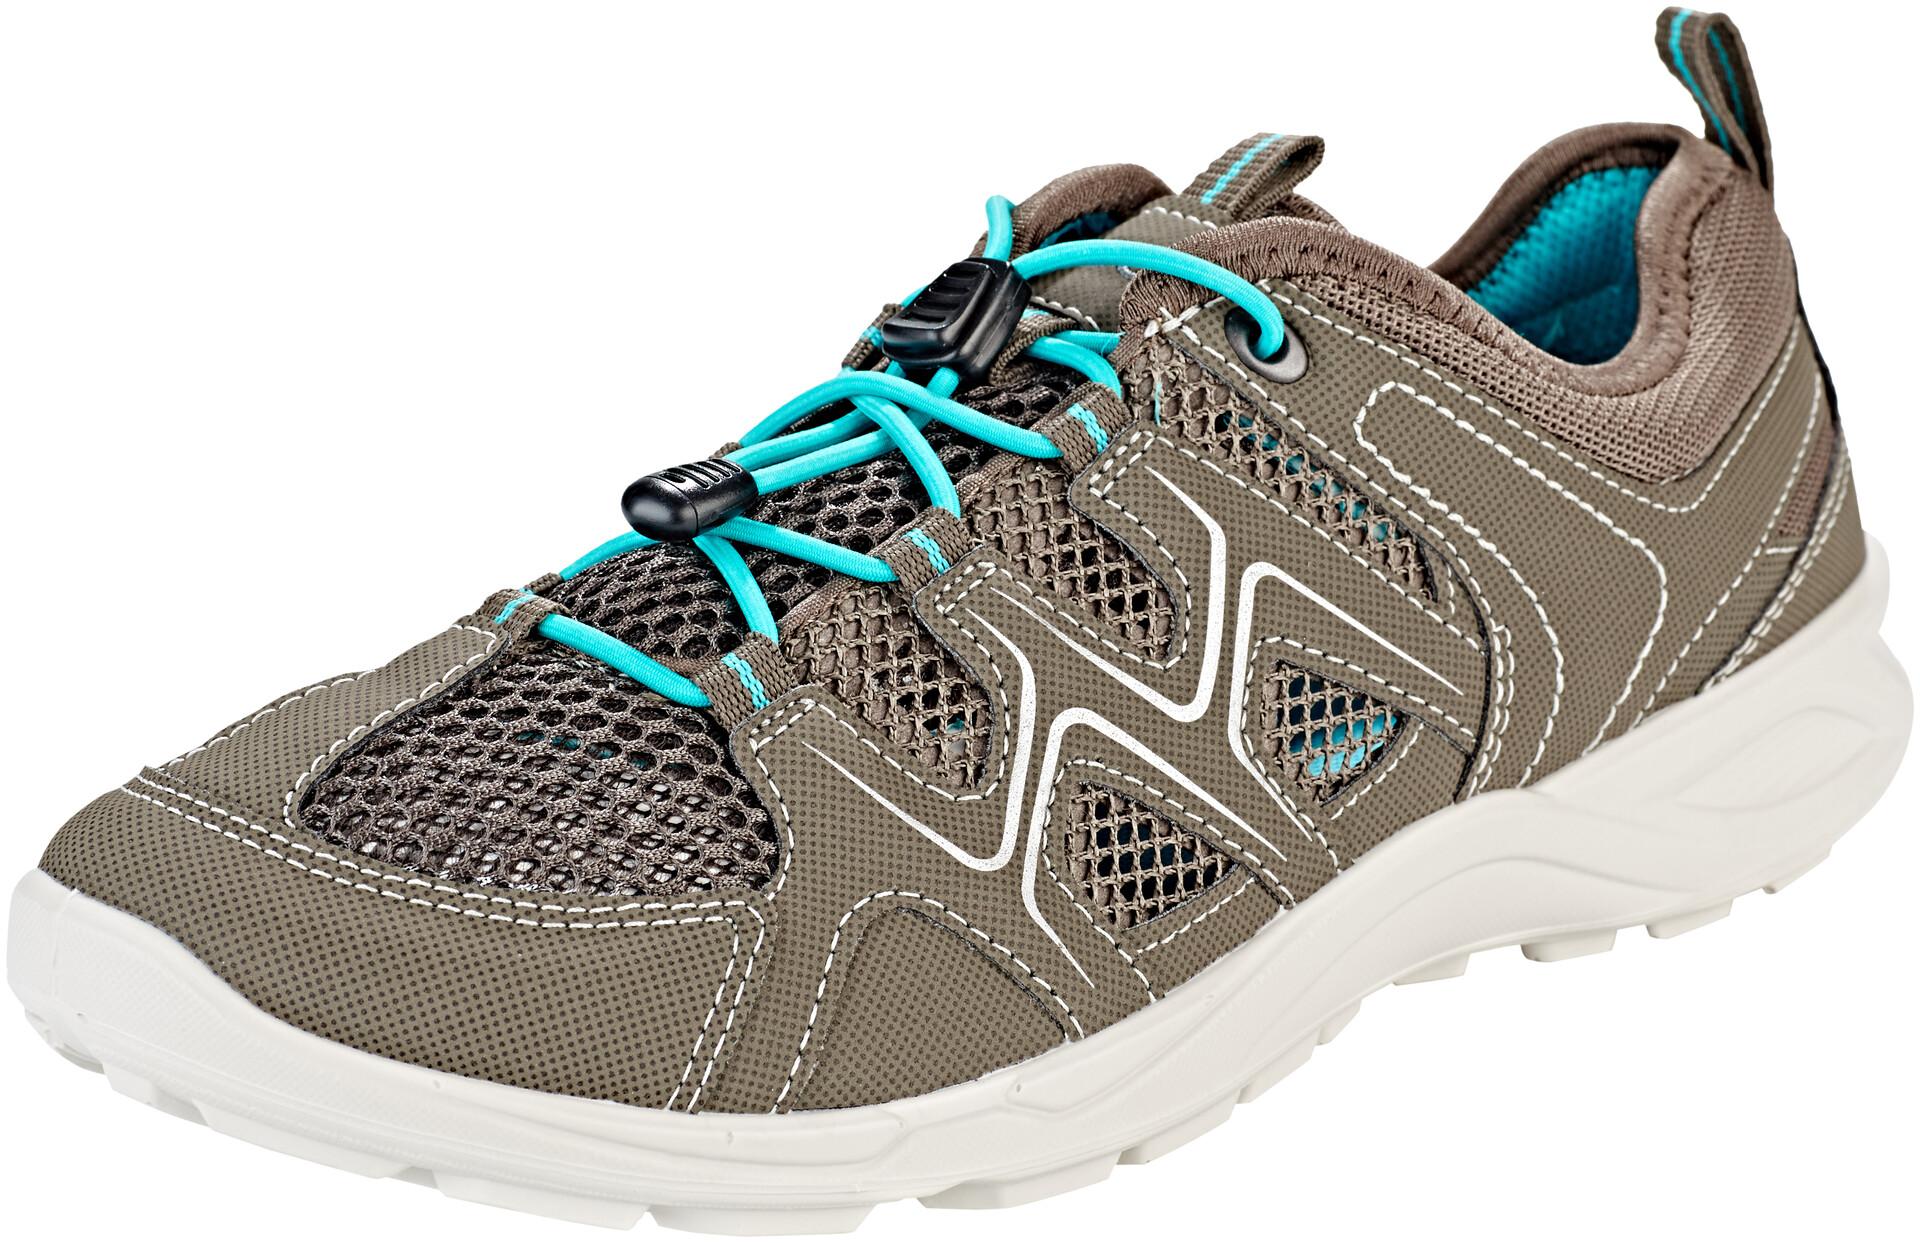 ECCO Terracruise LT Shoes Damen warm greydark clayturquoise